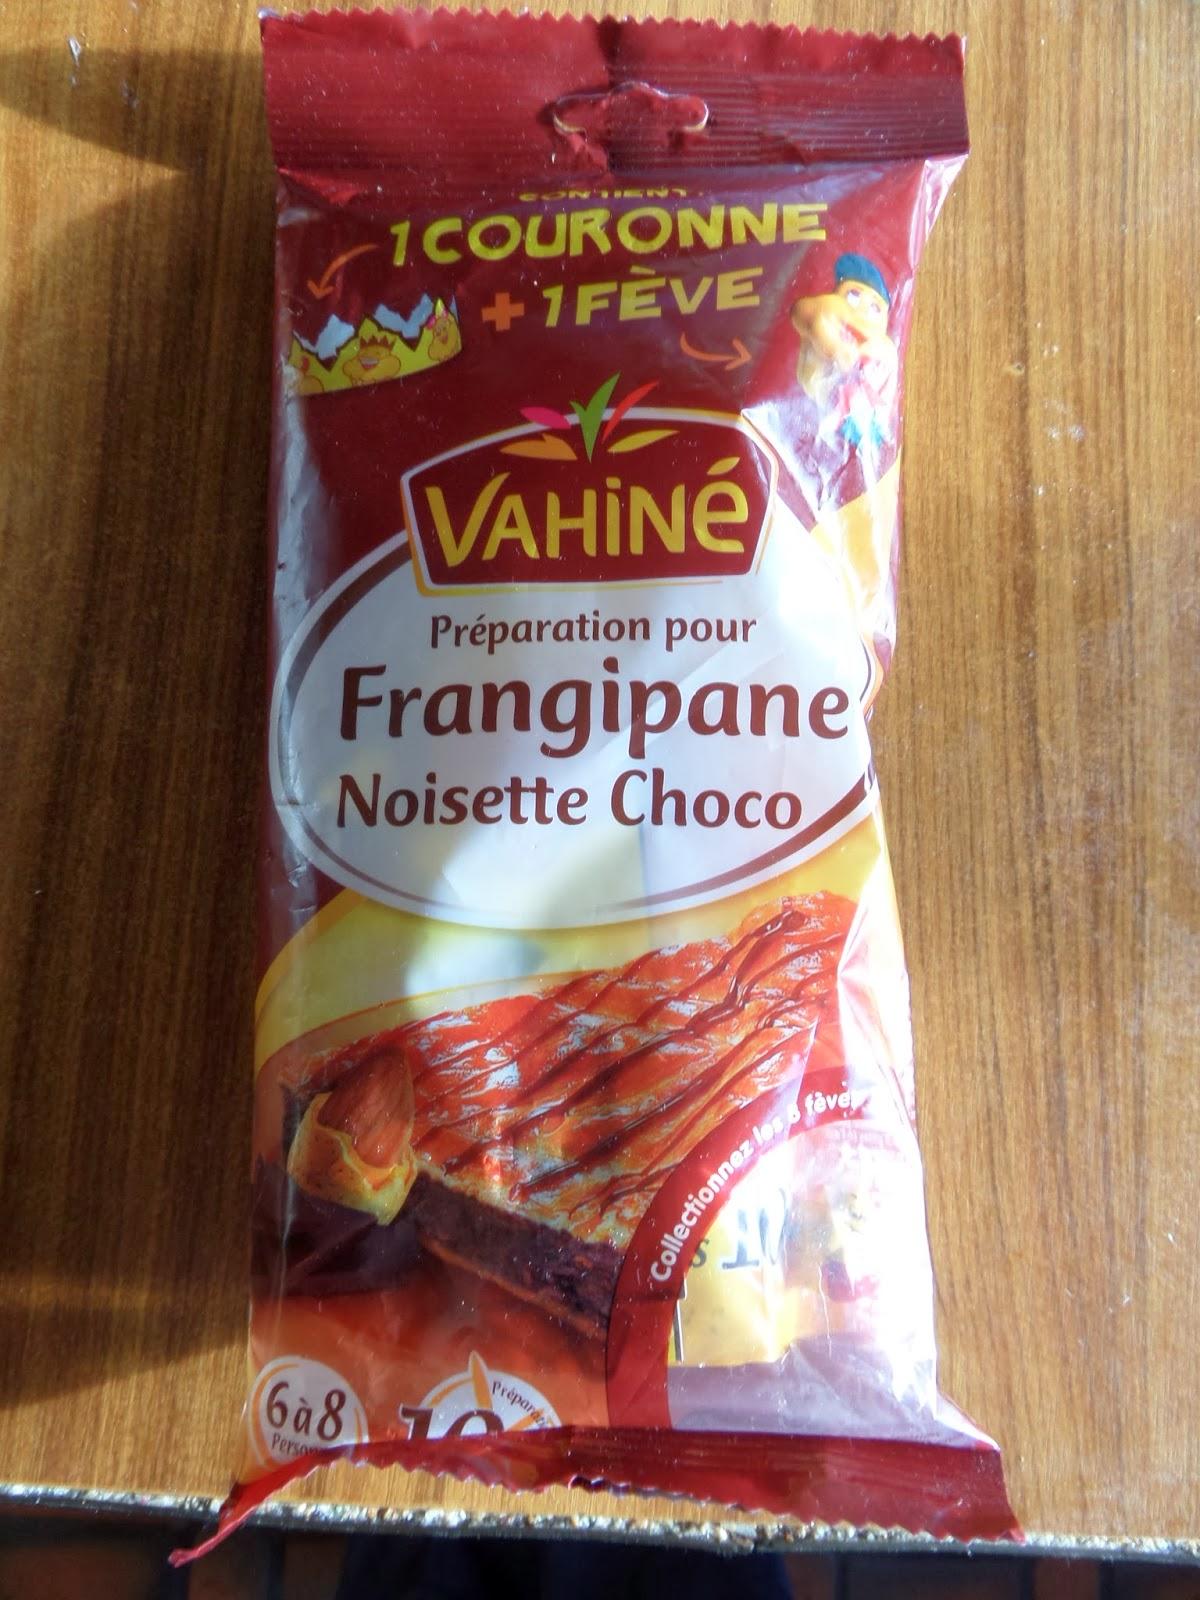 Madhouse family reviews making a french galette des rois for Decoration galette des rois frangipane